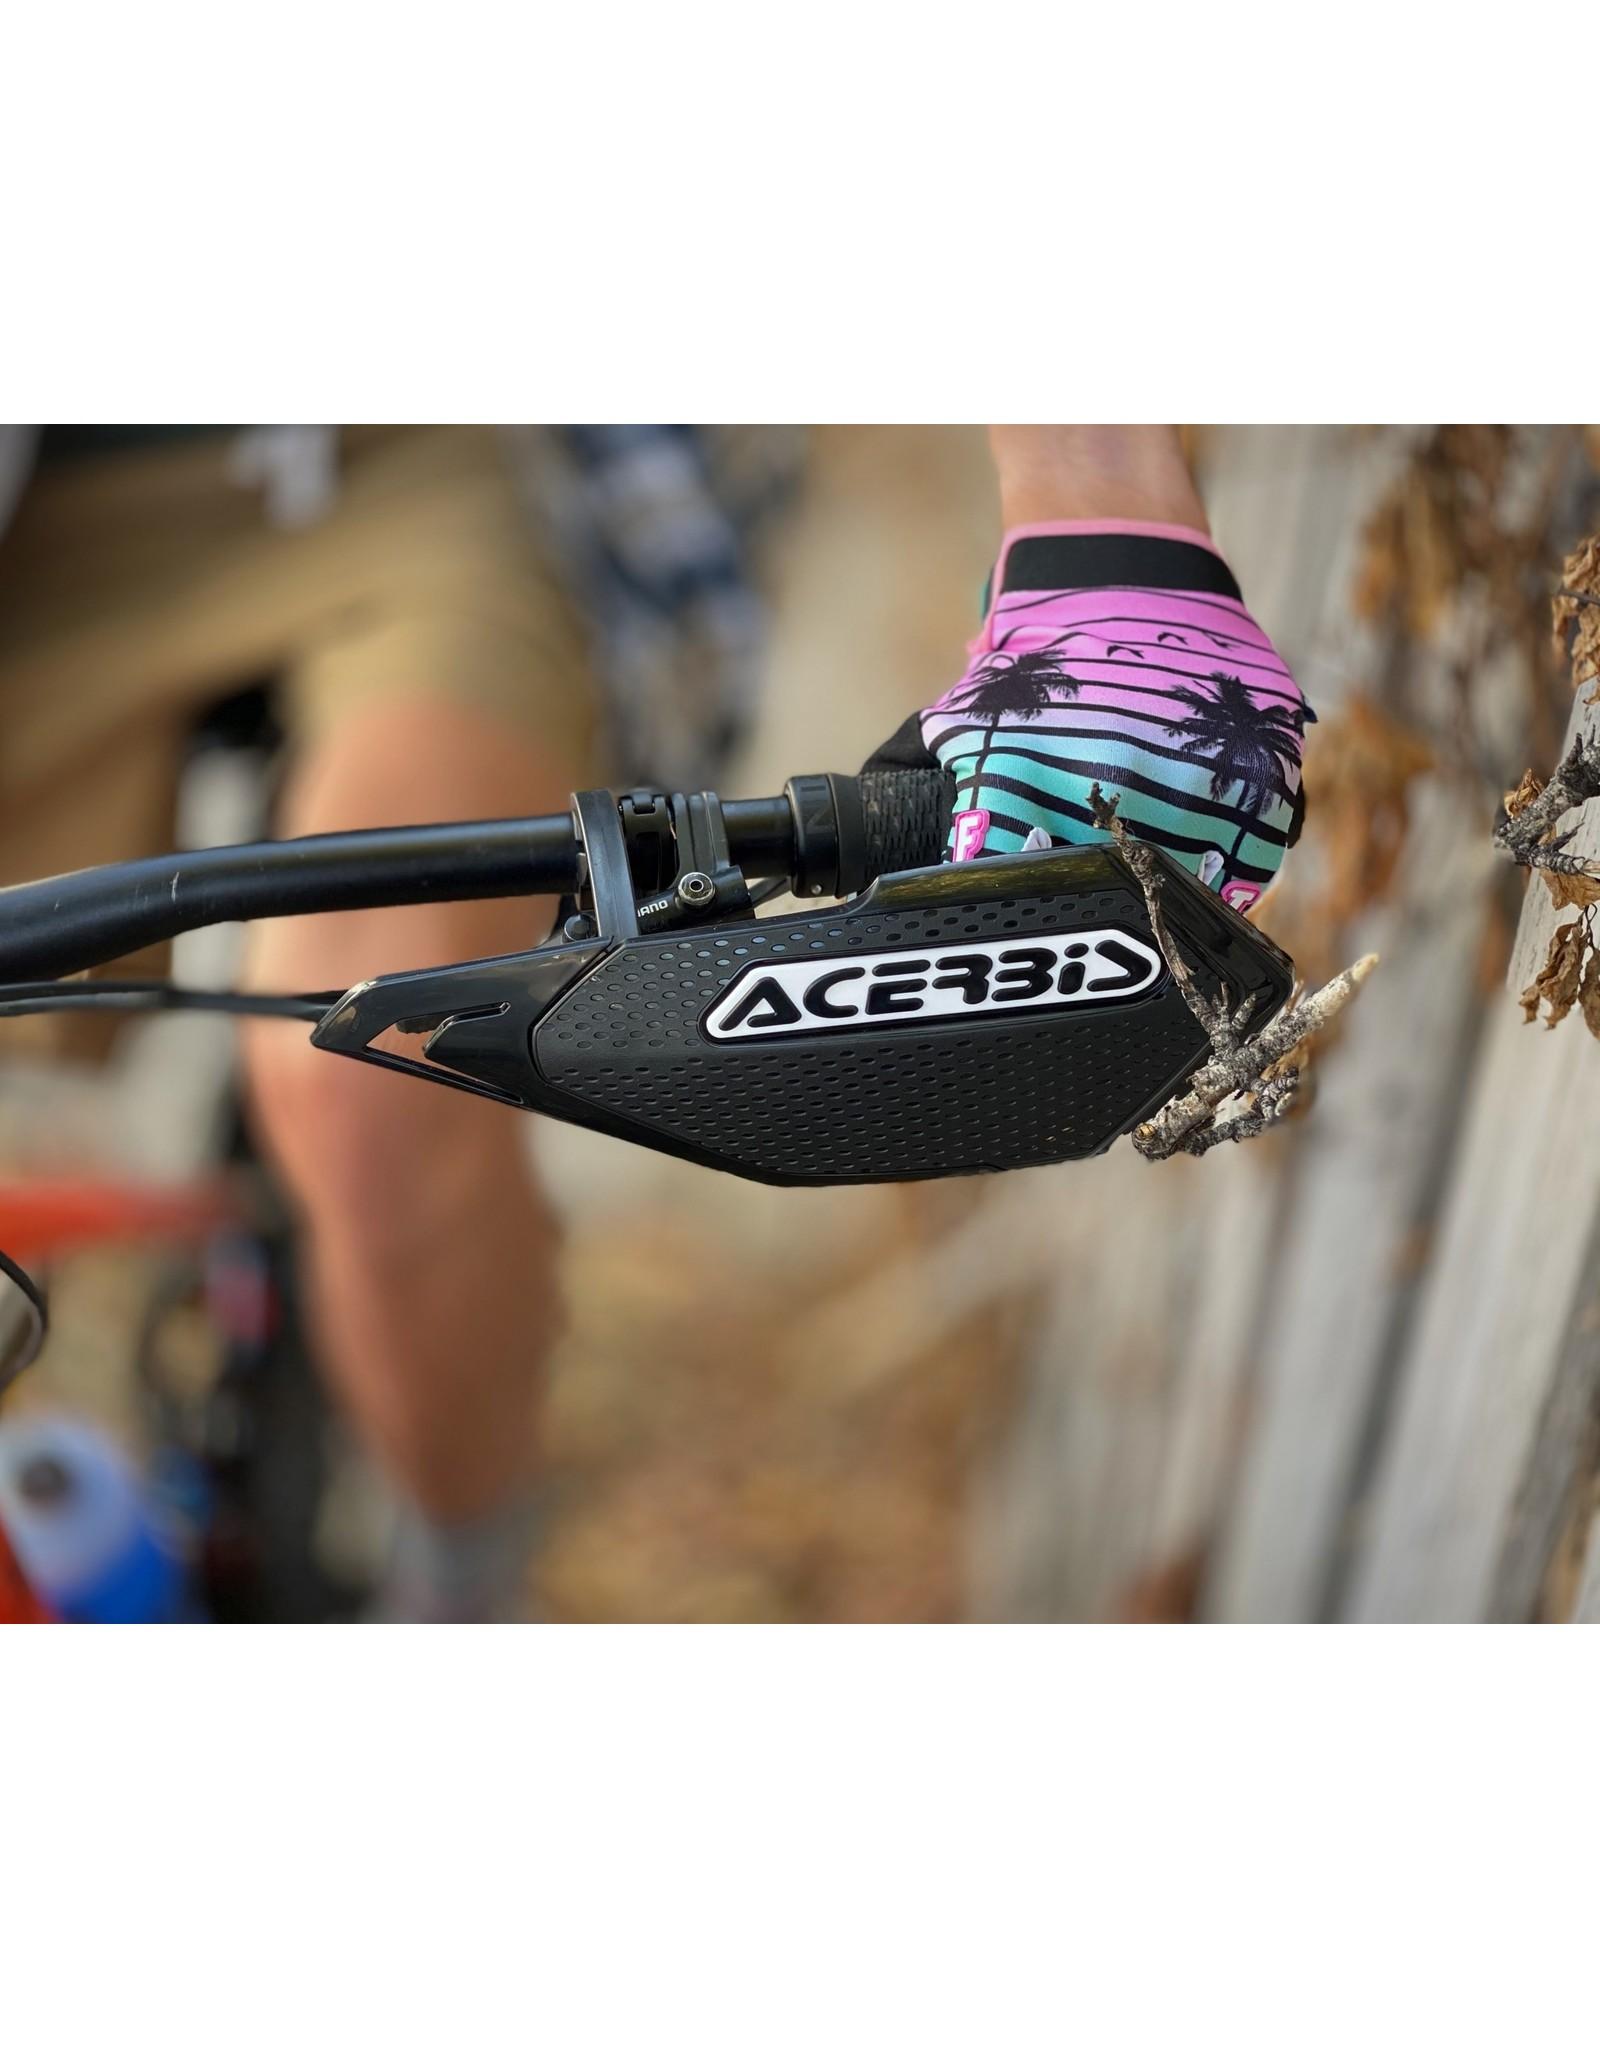 acerbis-acerbis-x-elite-mountain-bike-ha